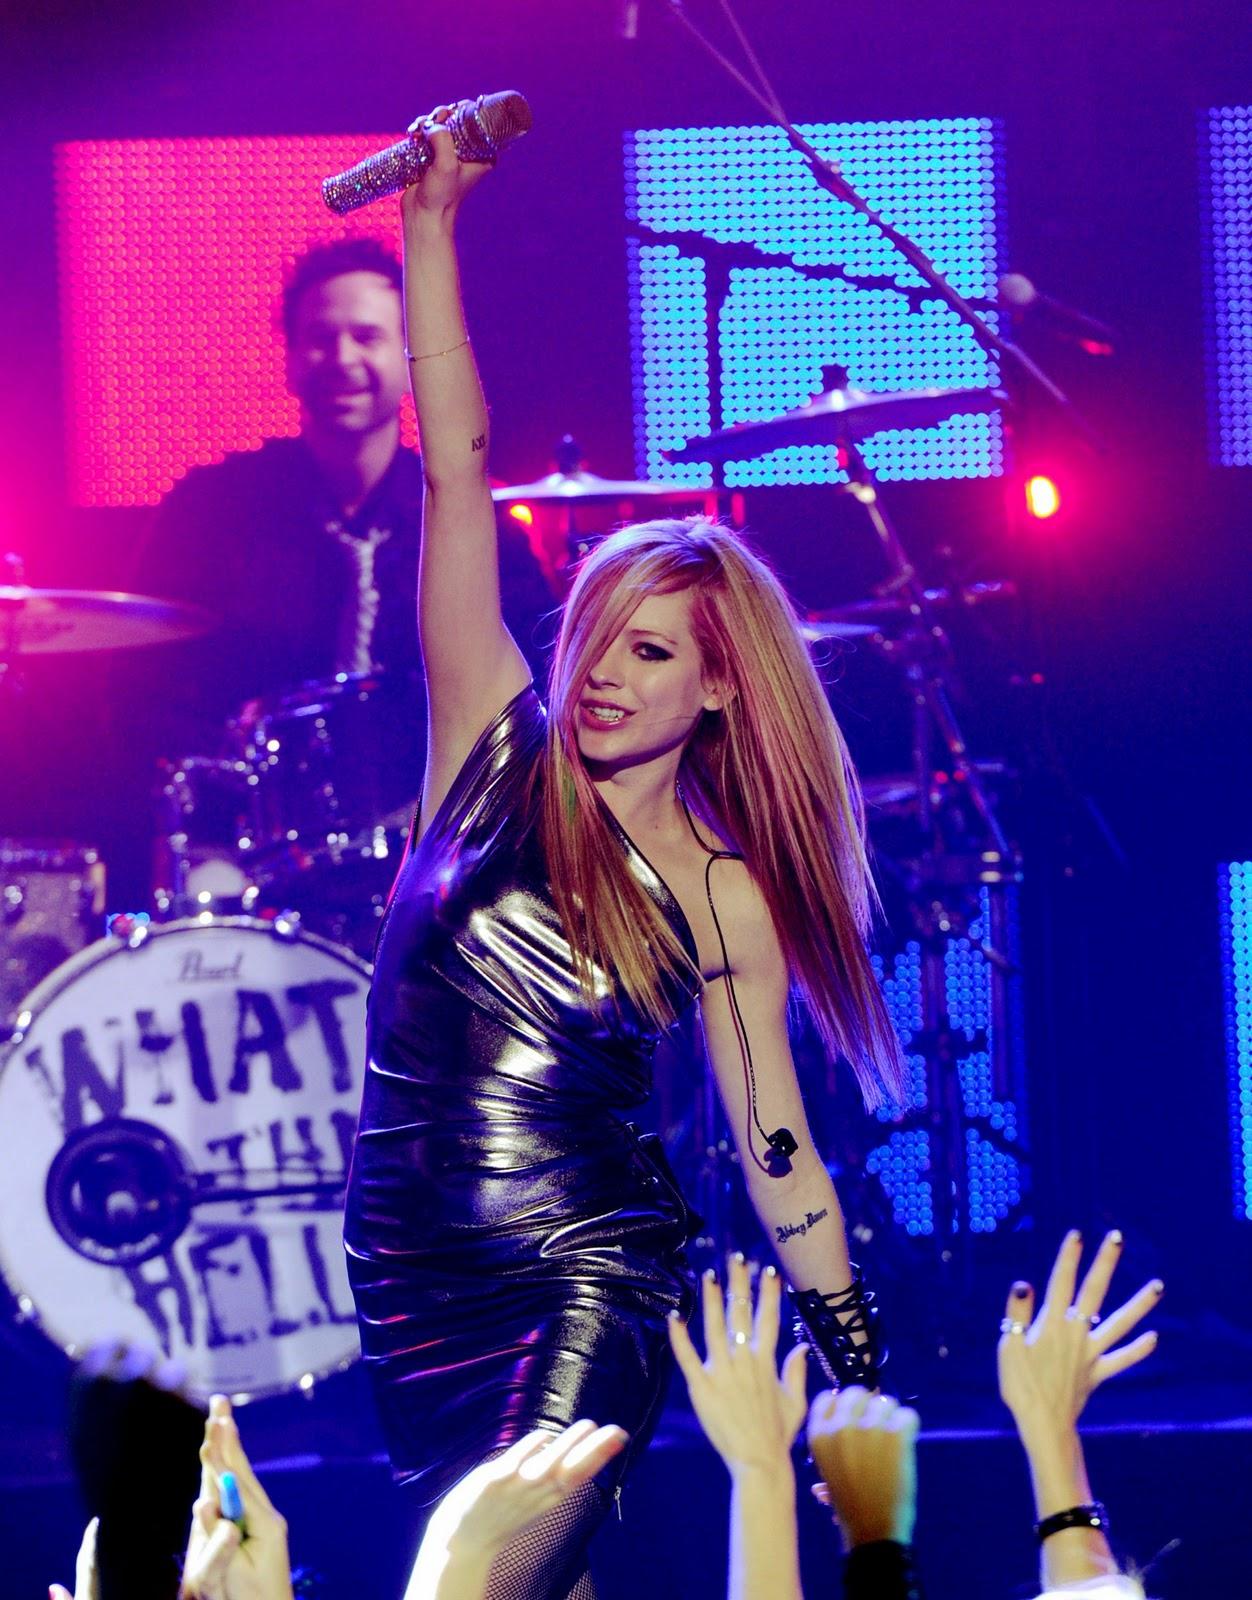 http://2.bp.blogspot.com/__614cJZkG1g/TR8wLYWkqmI/AAAAAAAAAIo/p-EUi6gDfvw/s1600/www_expostas_com_Avril_Lavigne_-_Dick_Clark%2527s_New_Year%2527s_Rockin_Eve_with_Ryan_Seacrest_hq003.jpg